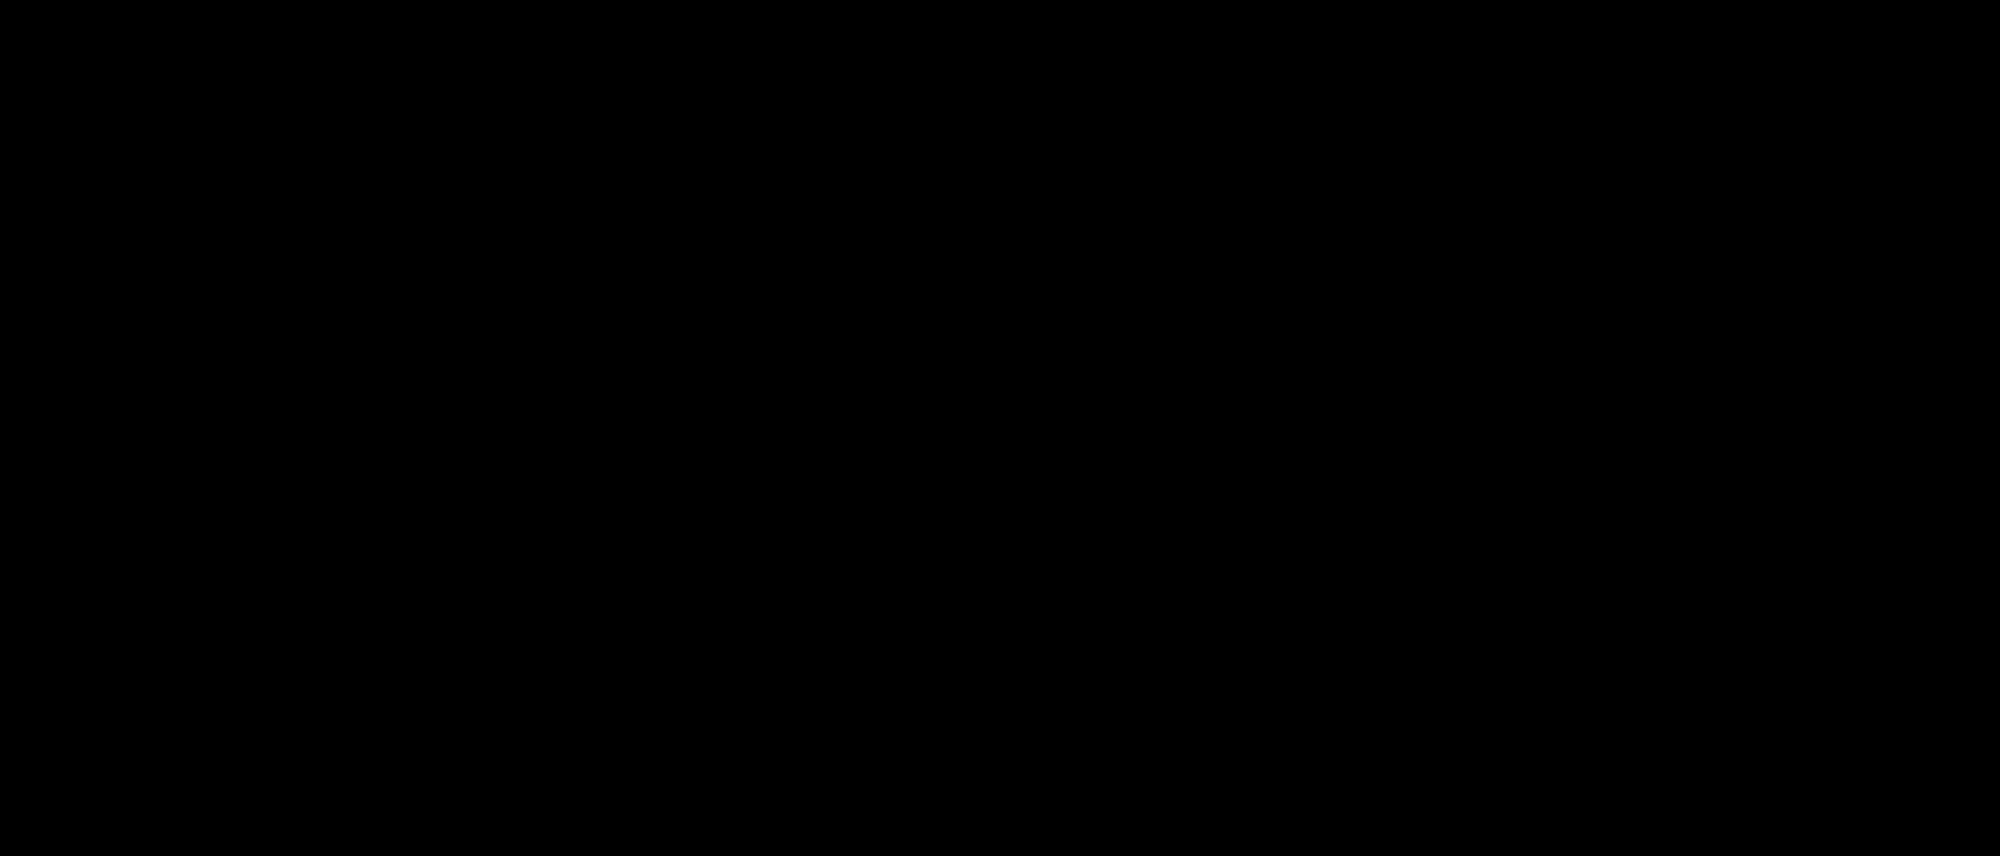 tive-int-05-option3-viz